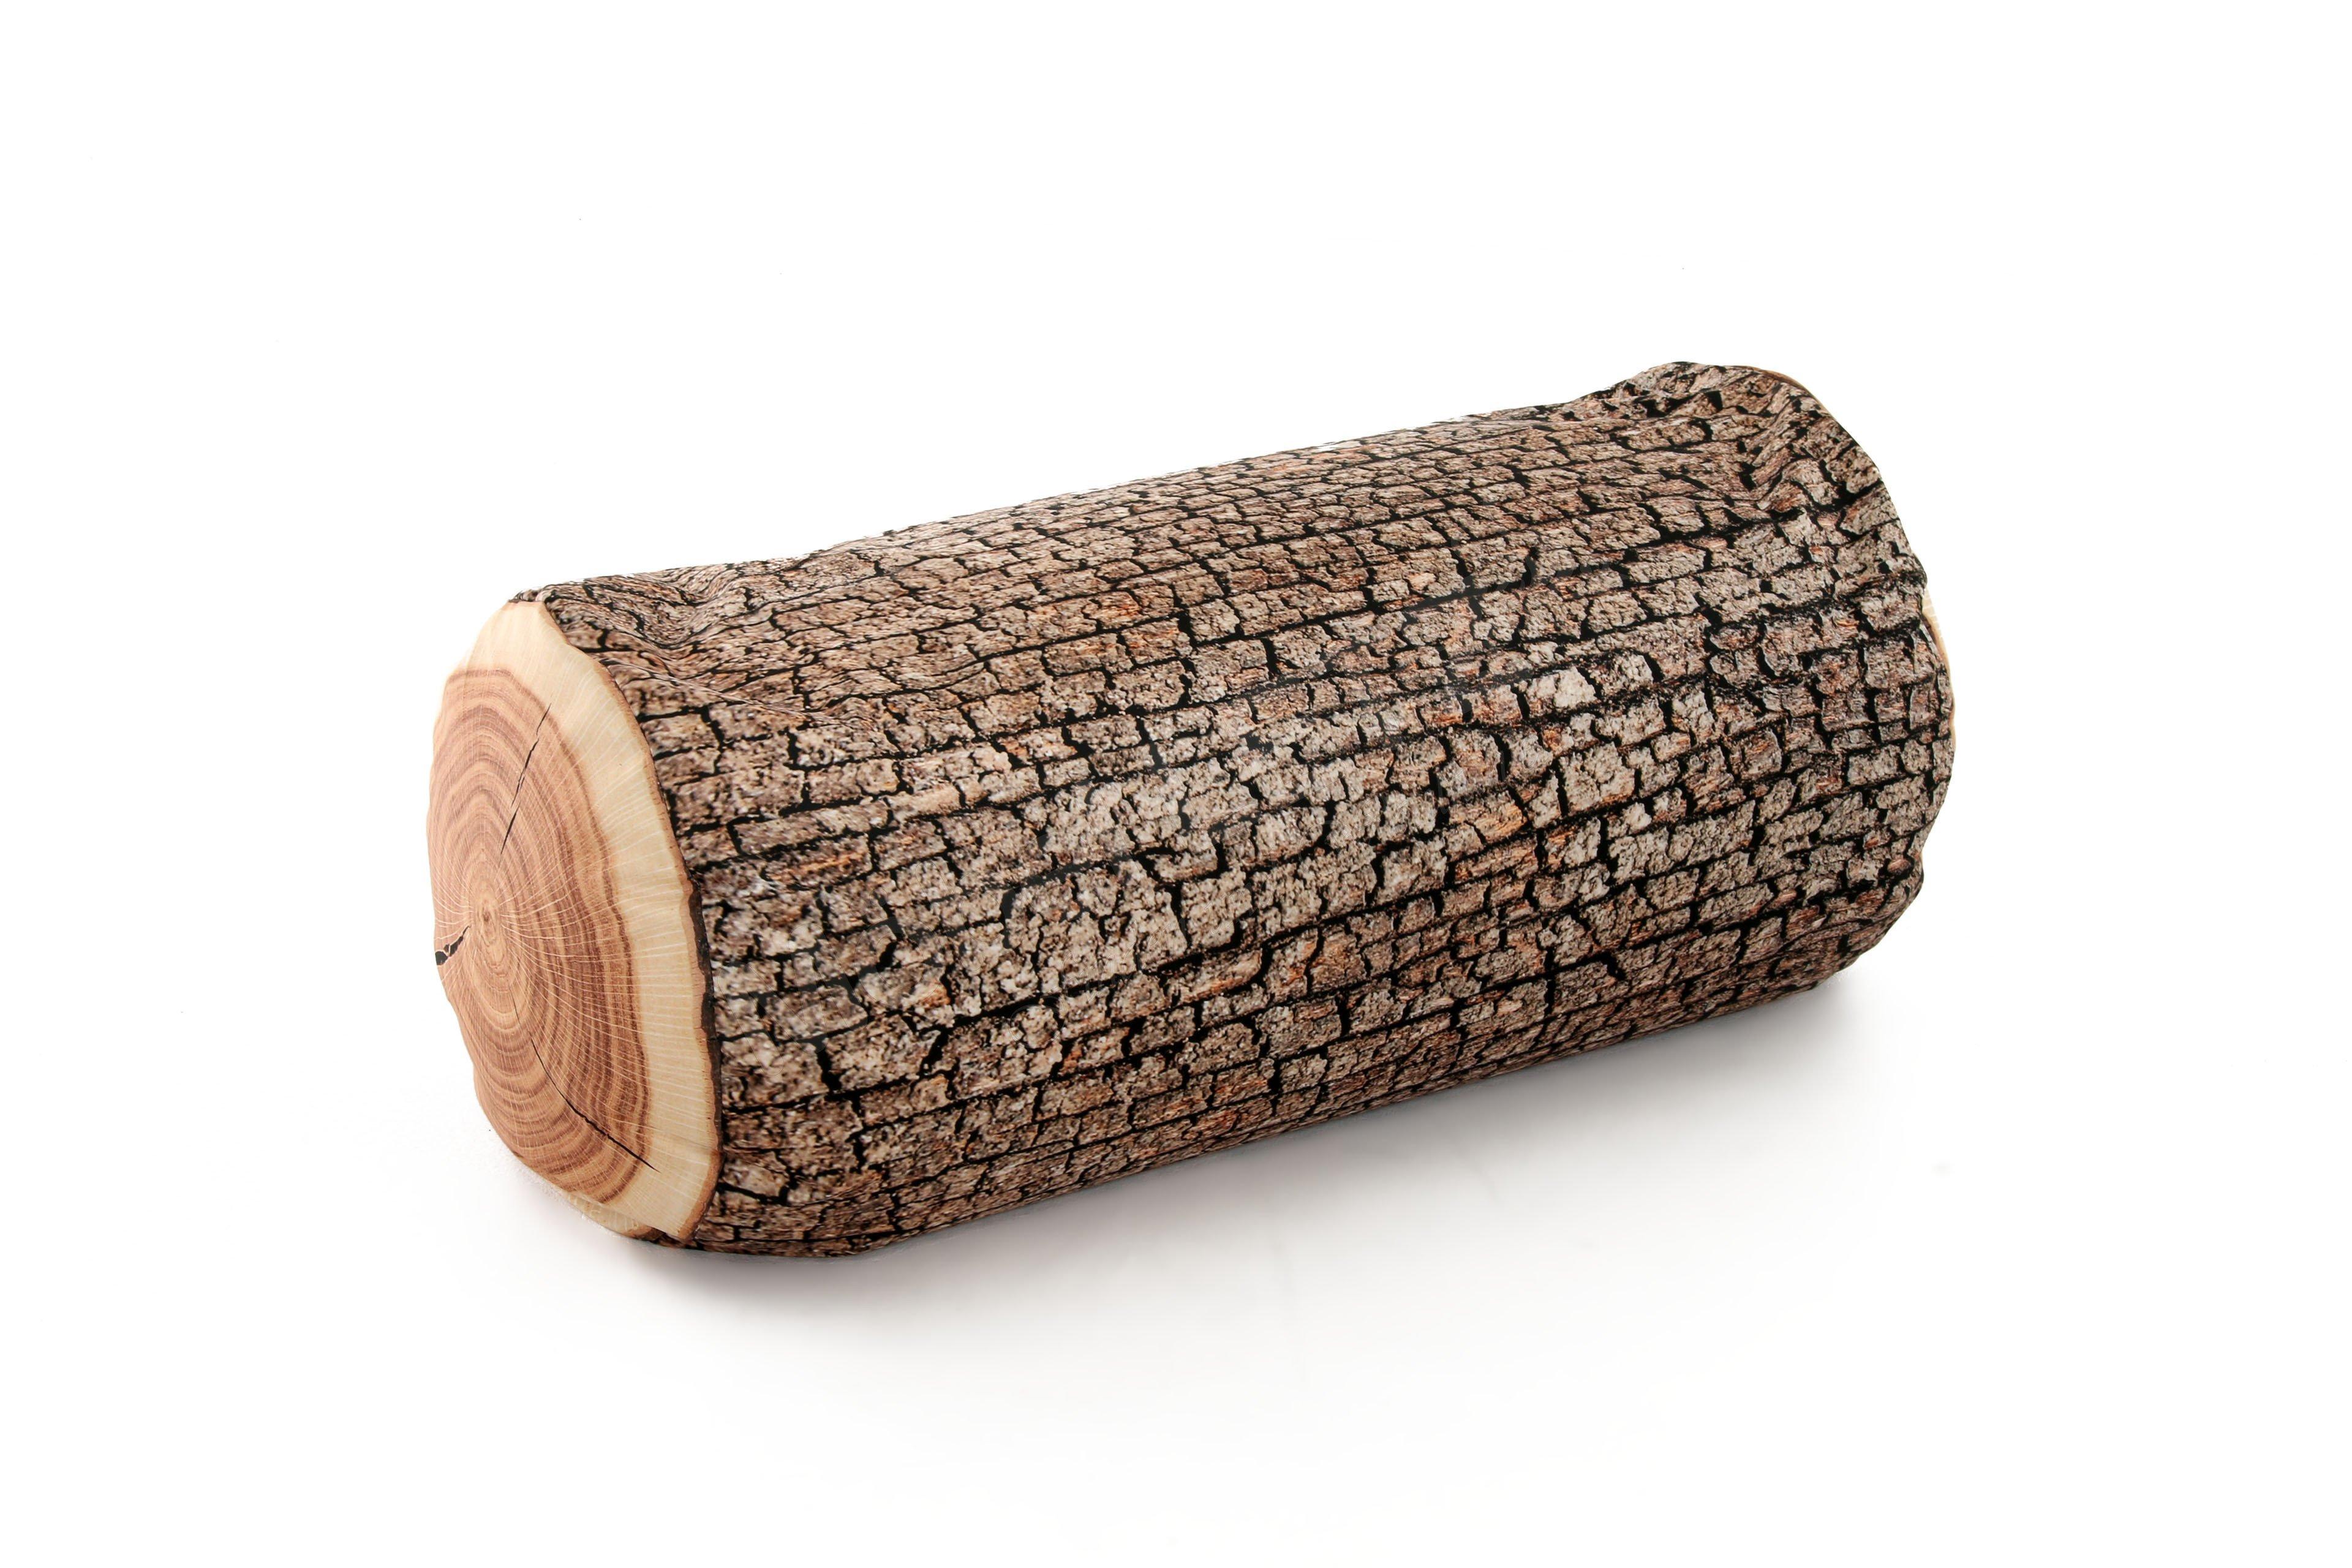 Lieblings Sitzsack DotCom Wood von Magma Heimtex Baumstamm braun   Möbel #EM_16